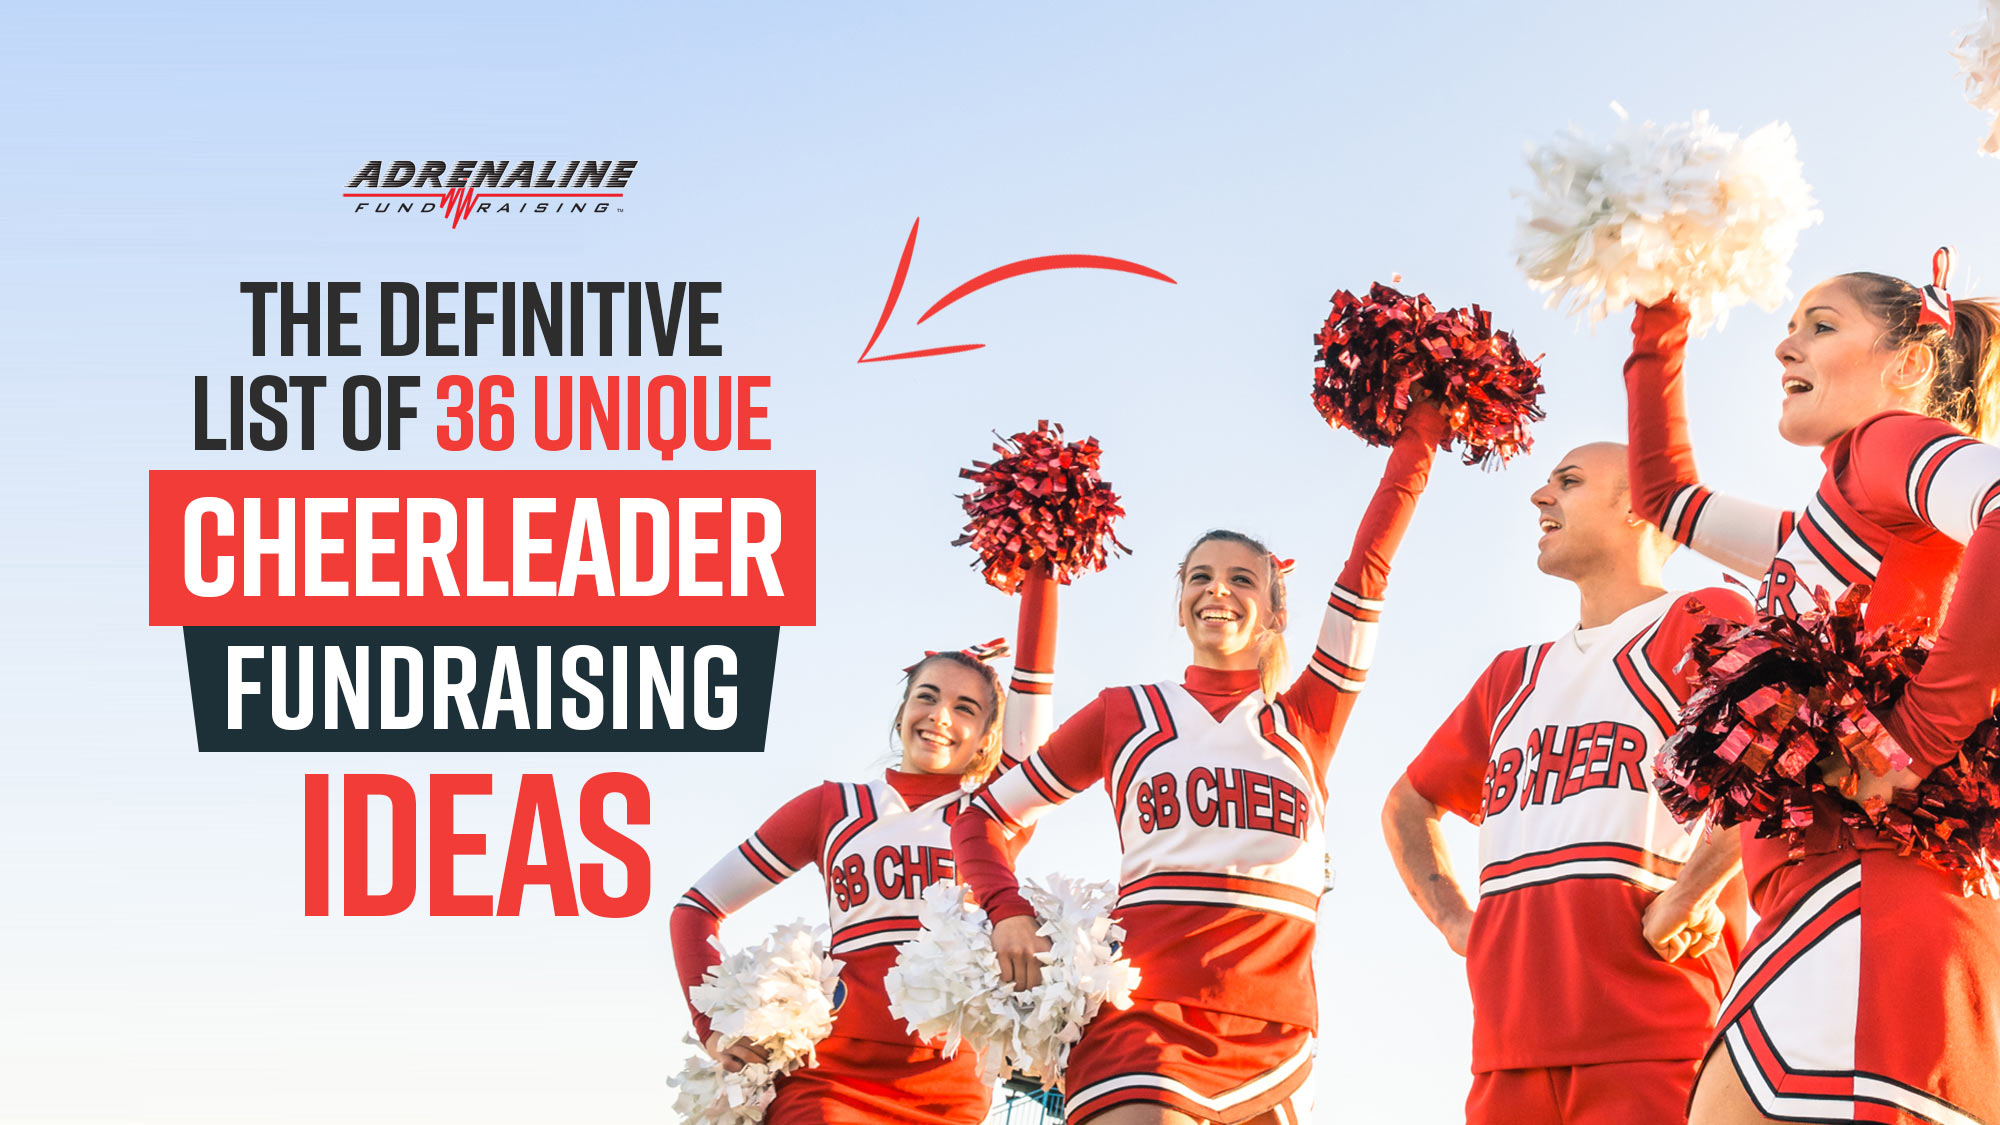 The Definitive list of unique Cheerleader Fundraising Ideas